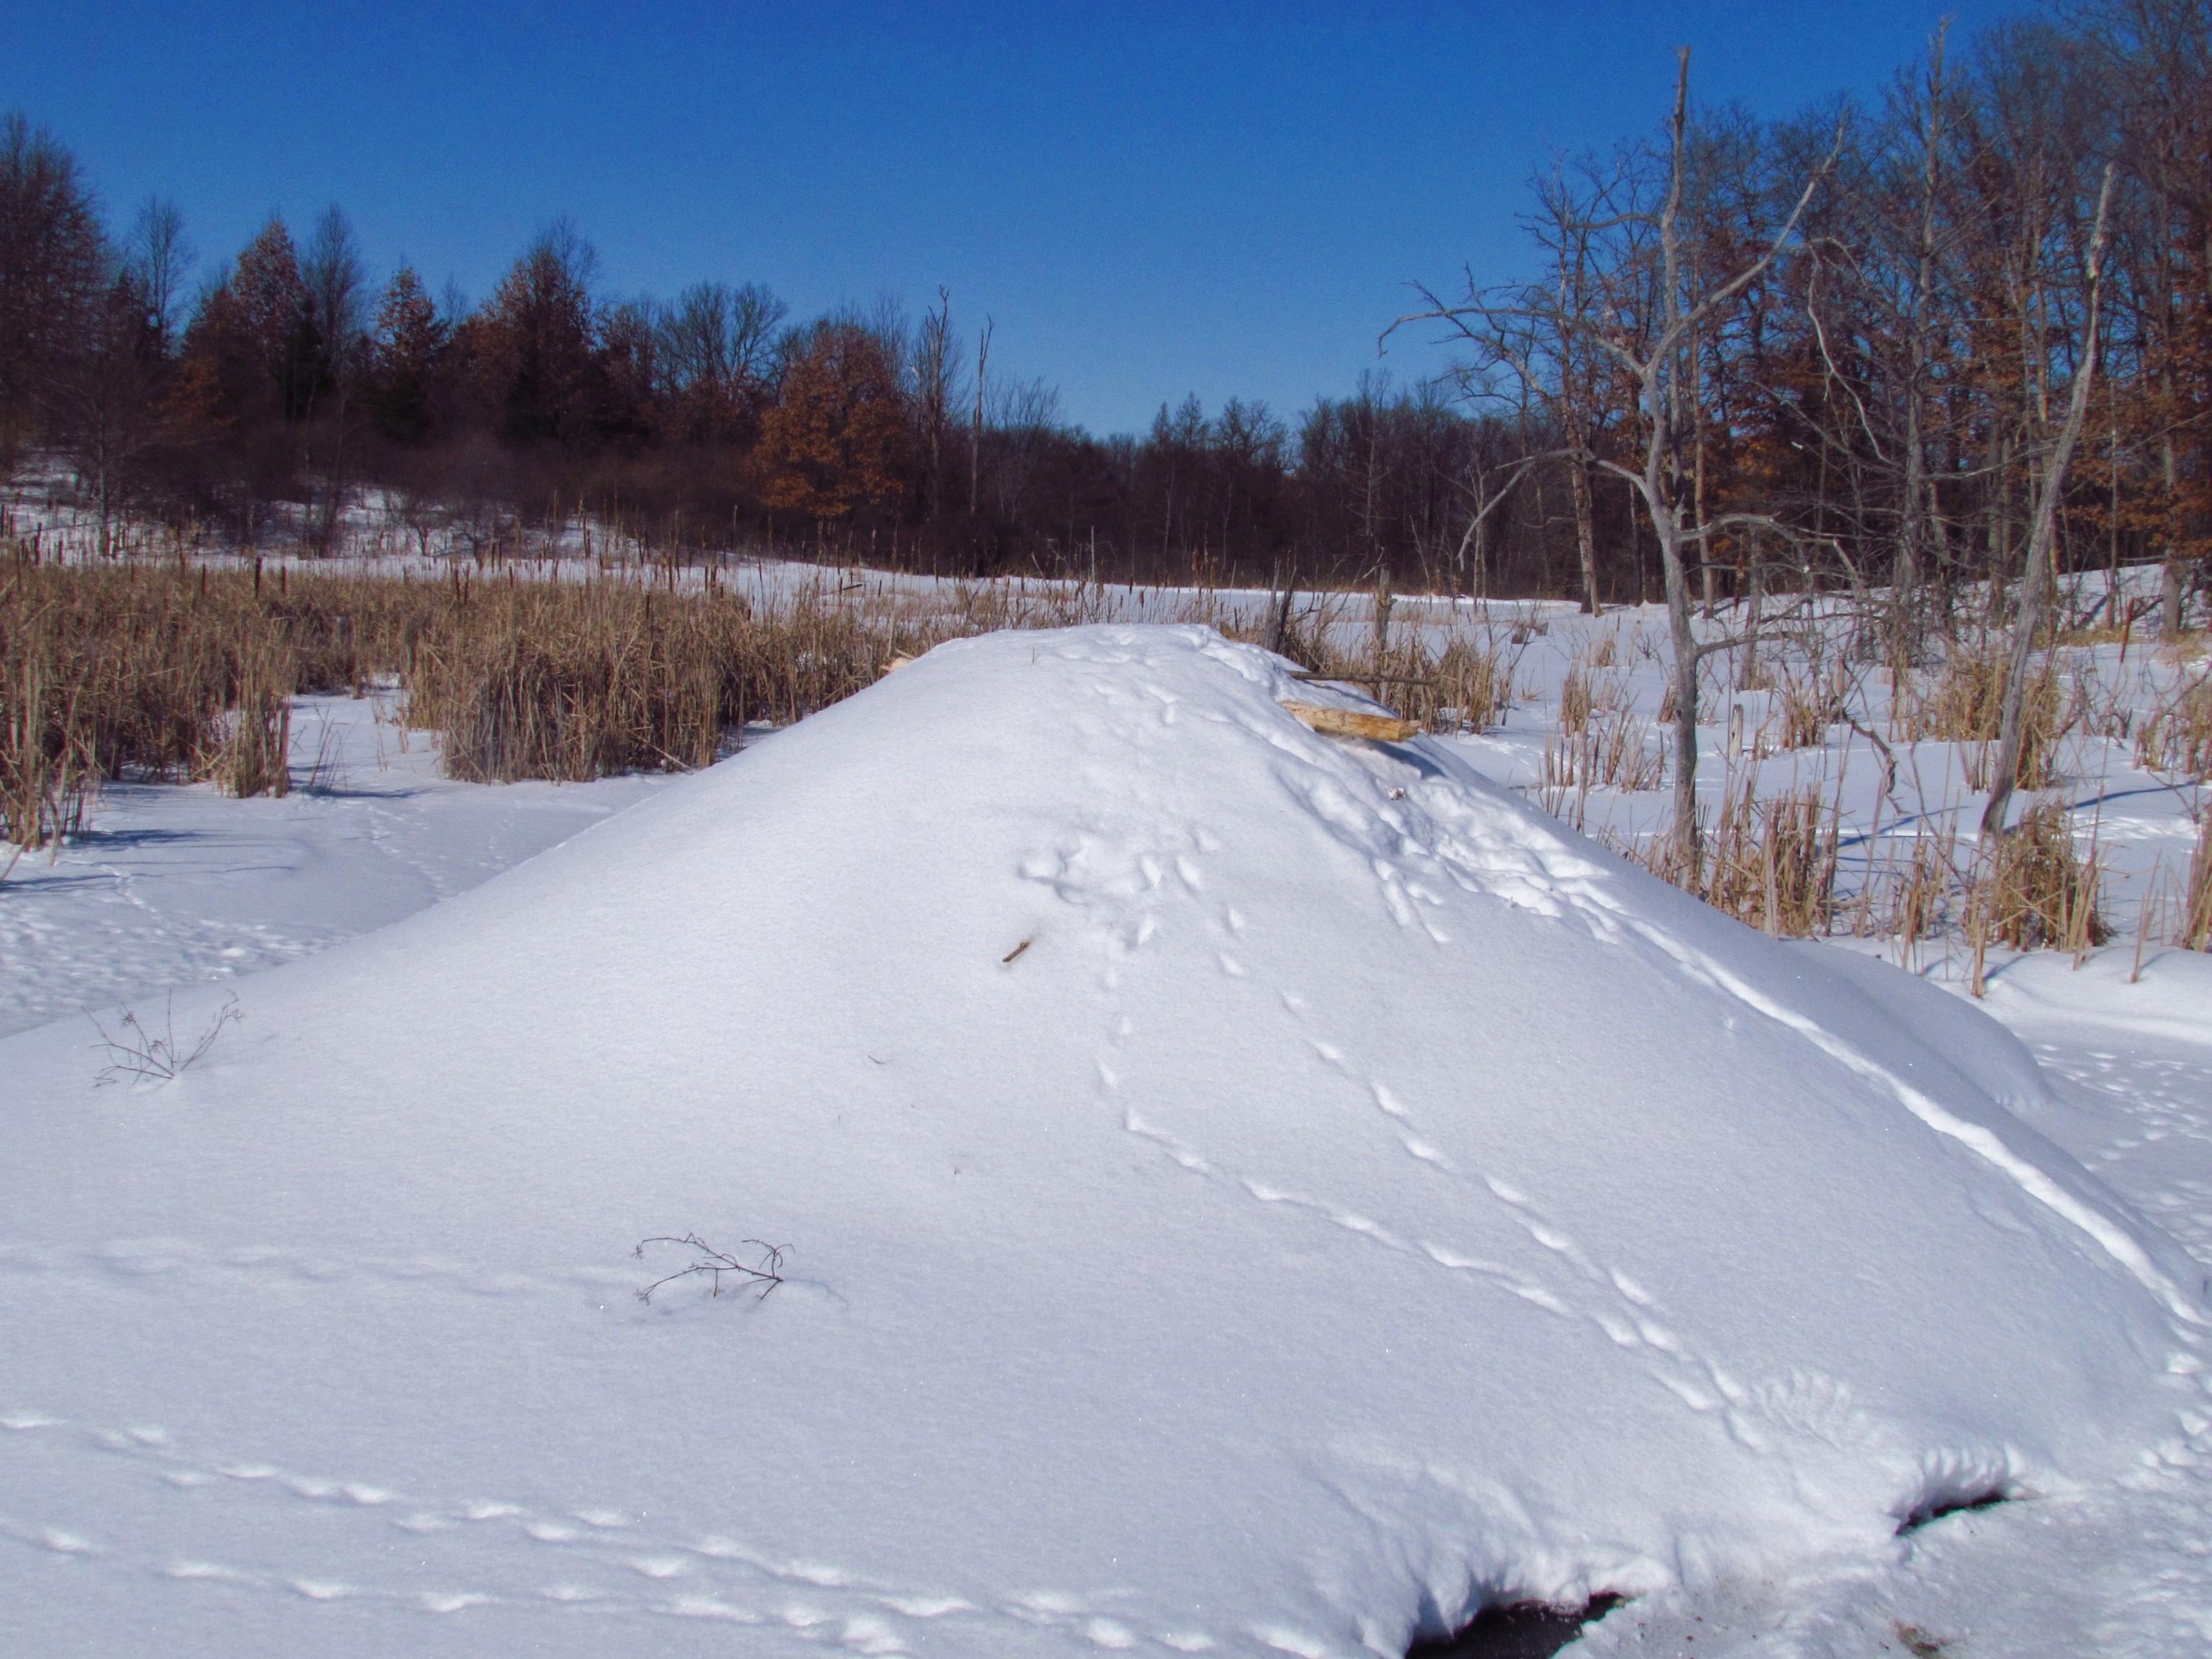 snow-covered beaver lodge